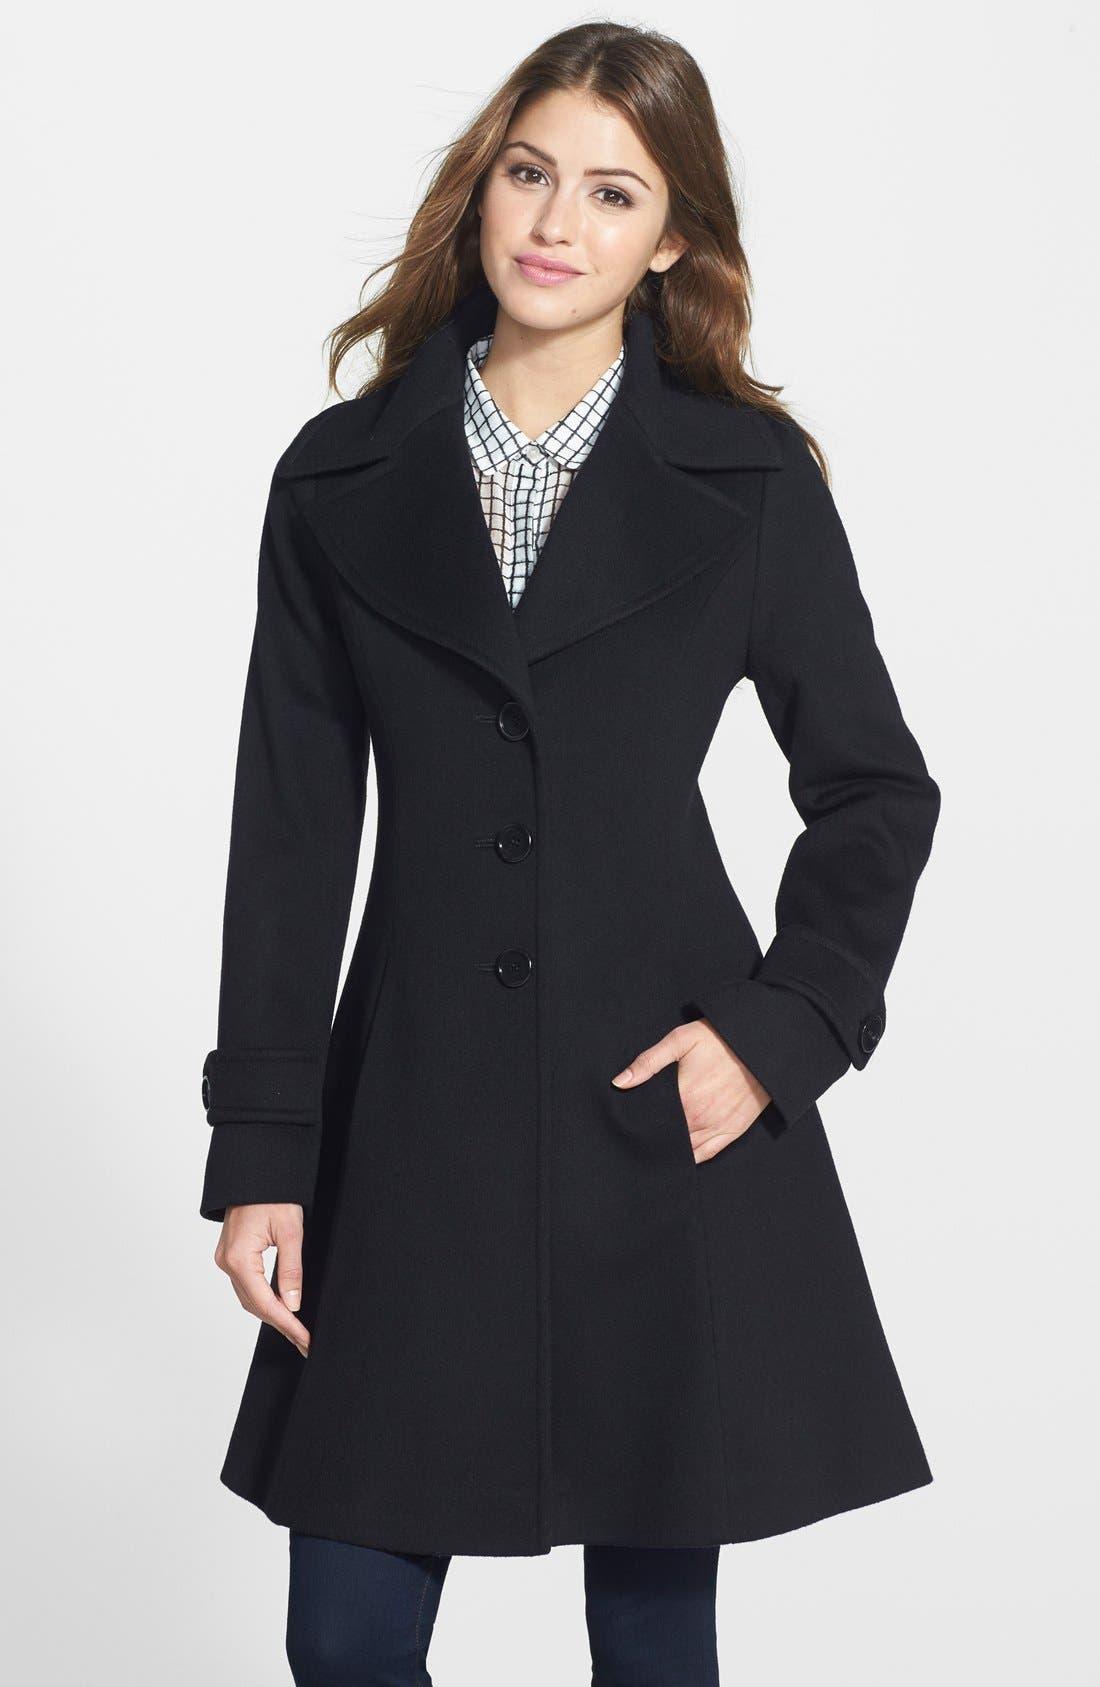 Alternate Image 1 Selected - Fleurette Loro Piana Wool Princess Coat (Petite) (Nordstrom Exclusive)